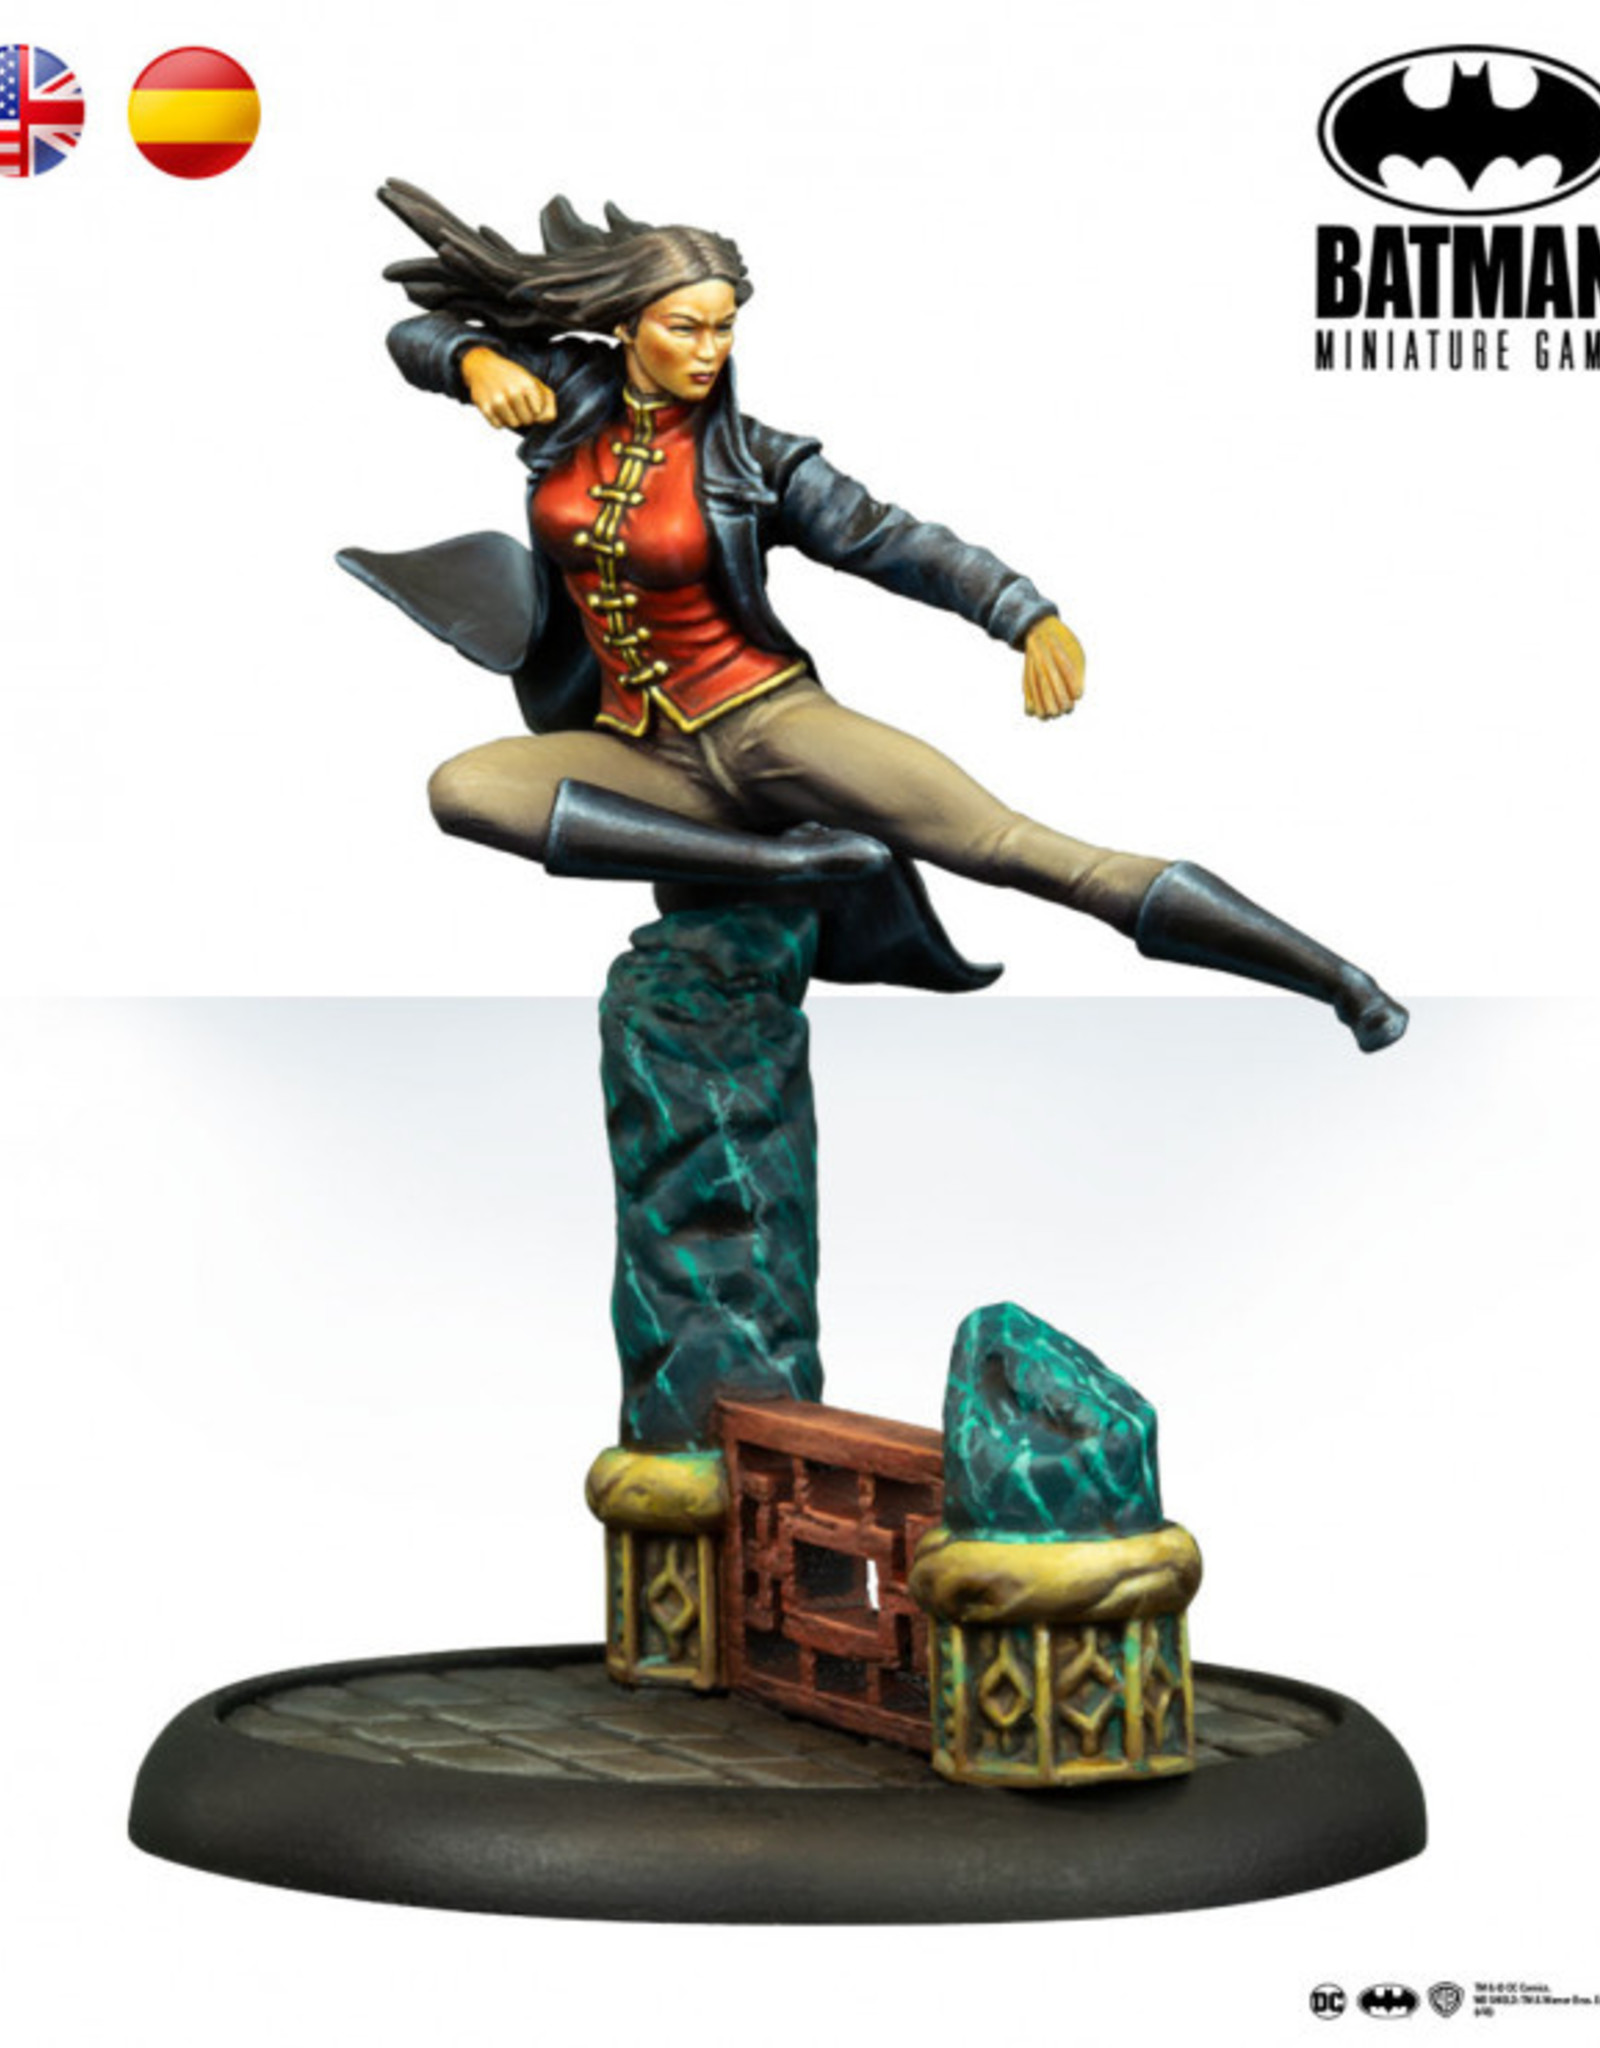 Batman Miniature Game: Lady Shiva